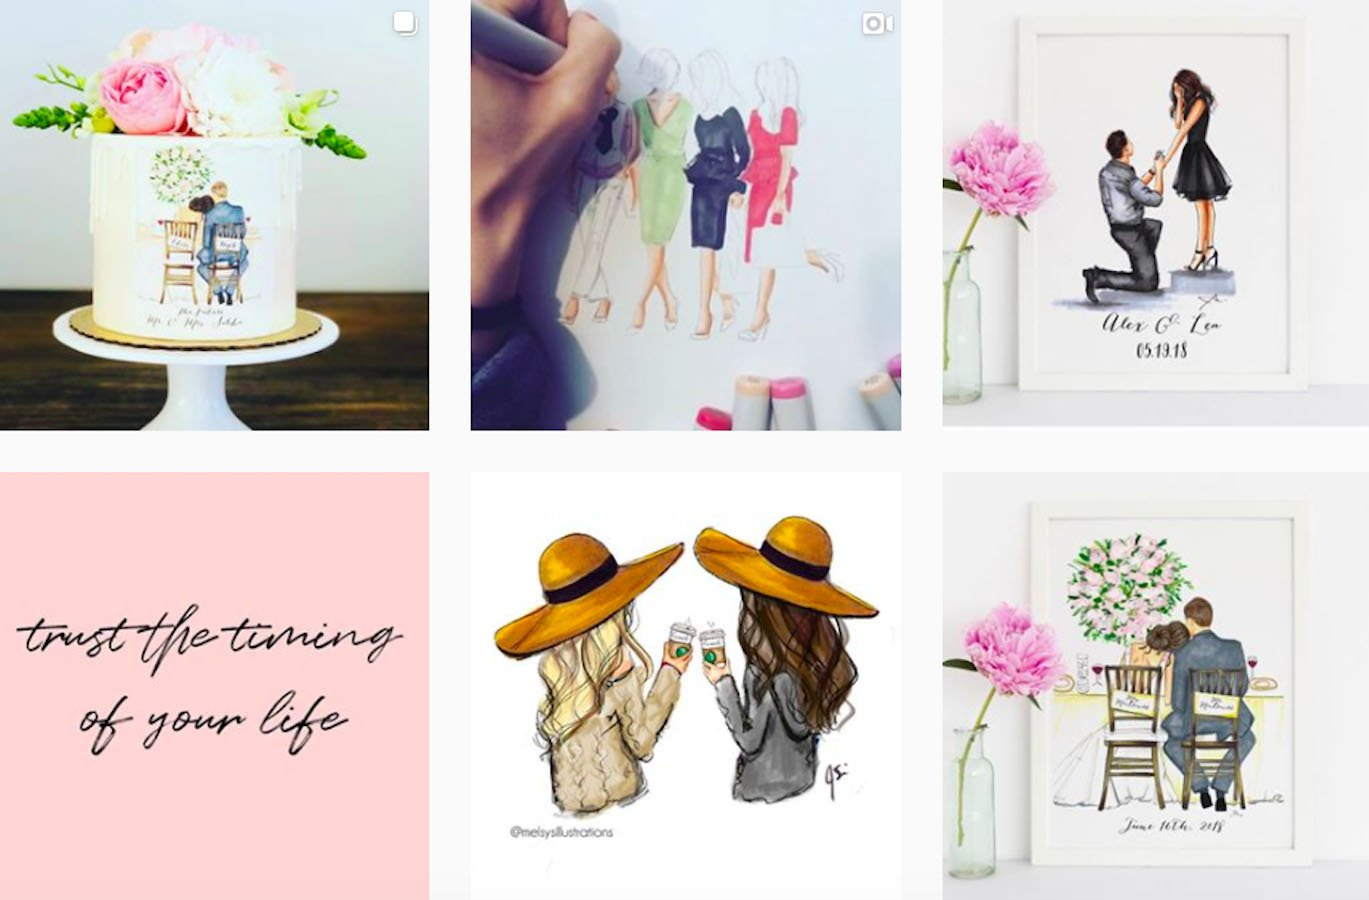 Web Design Inspiration: 110+ Accounts On Instagram and 10+ Best UX & Web Design Books in 2020 - melsysillustrations